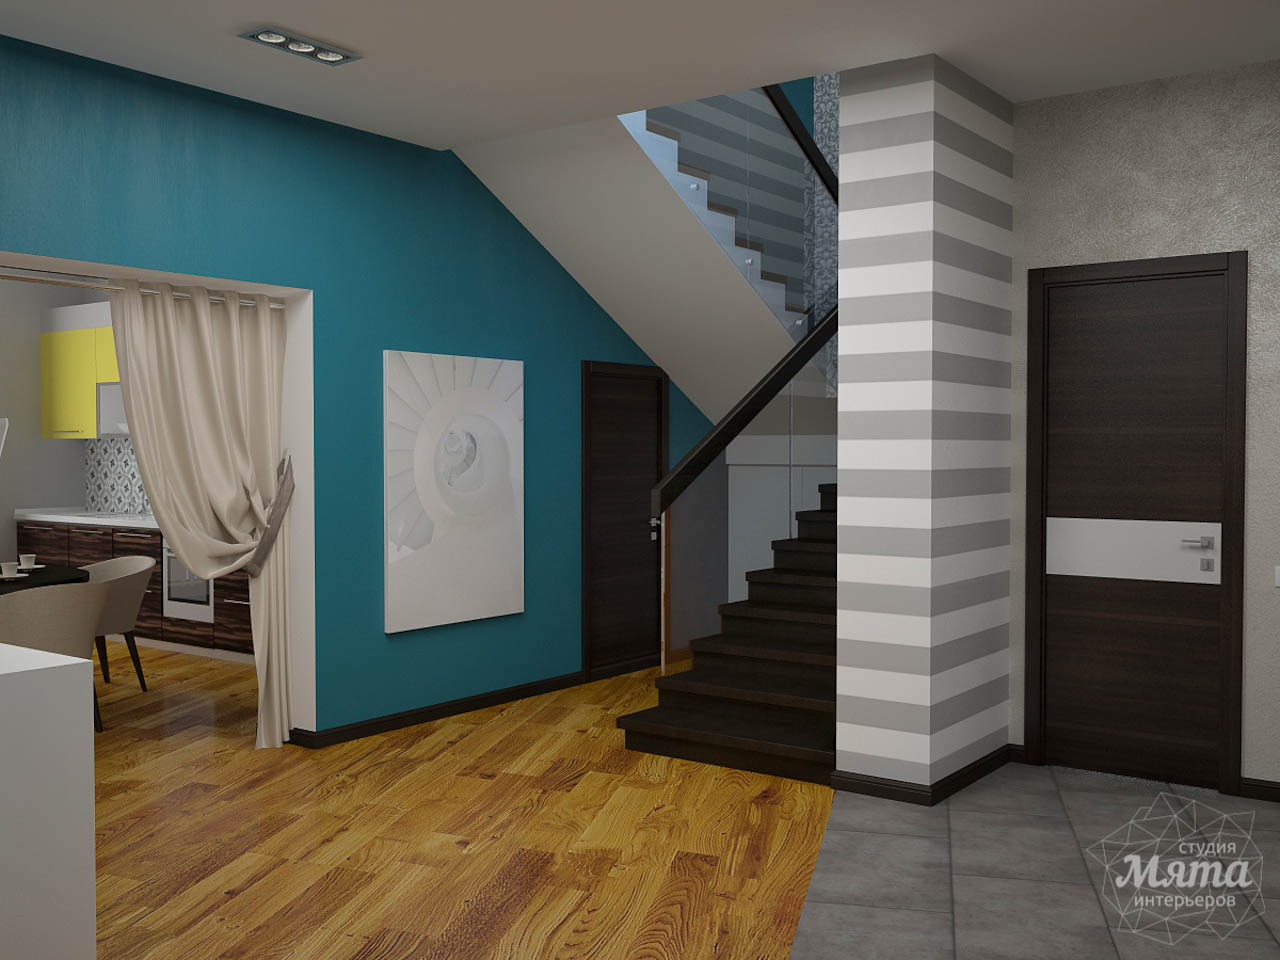 Дизайн проект интерьера коттеджа  в стиле минимализм по ул. Барвинка 15 img963754241